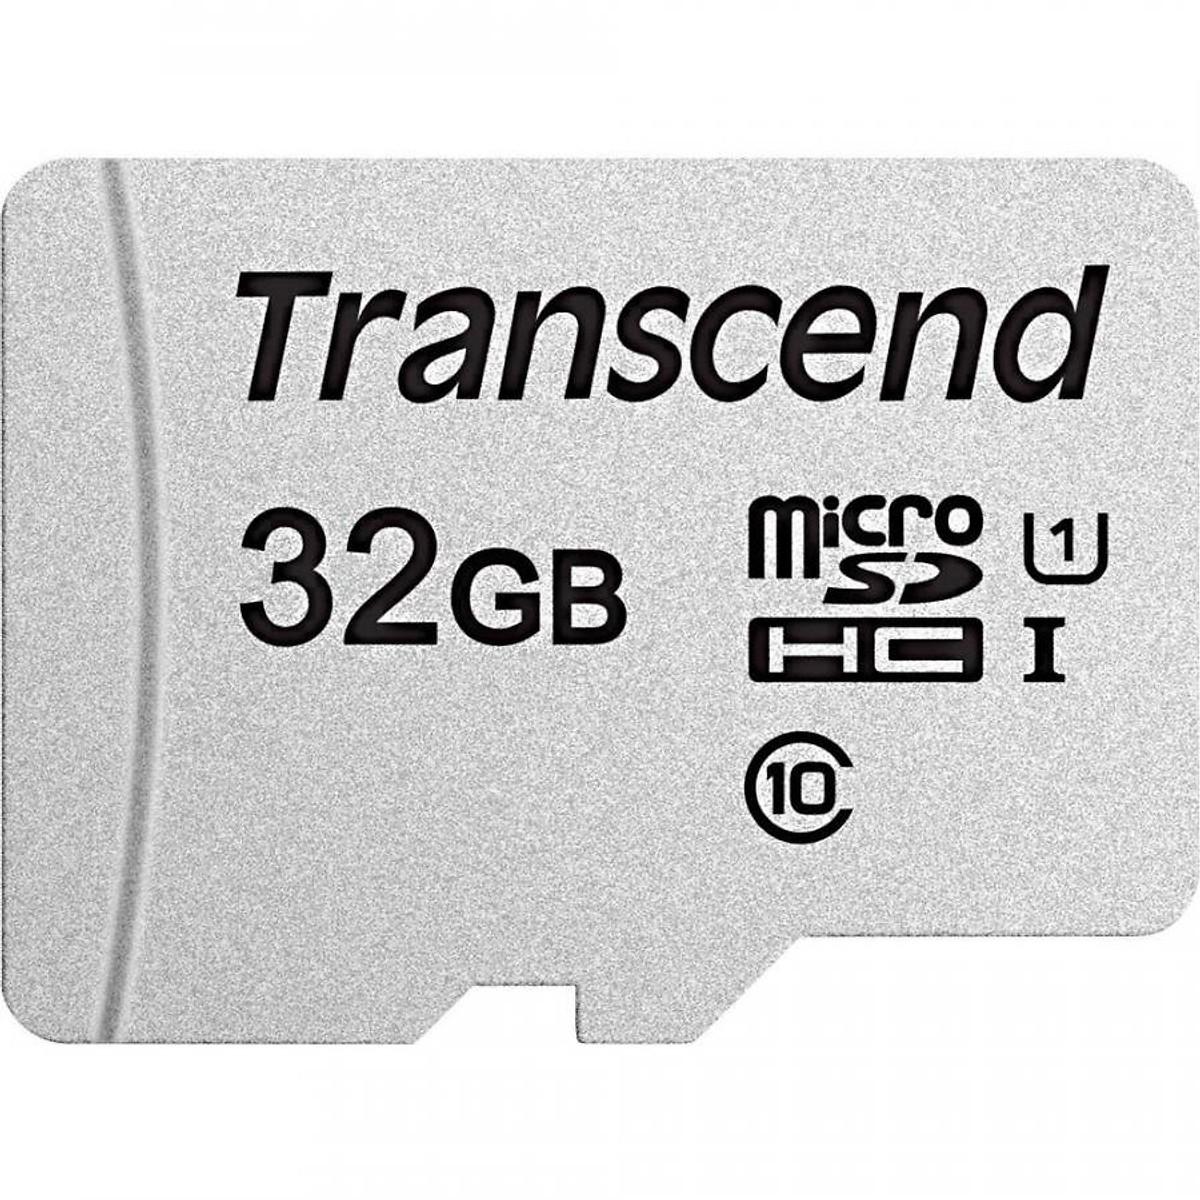 Transcend  - Thẻ Nhớ Micro SD Transcend 32GB Class 10